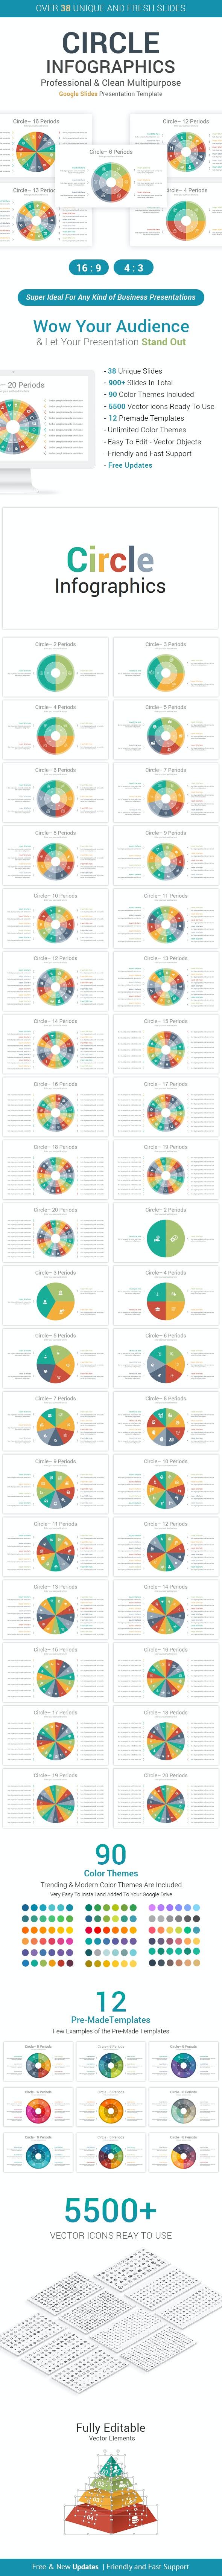 Circle Infographics Google Slides Template Diagrams - Google Slides Presentation Templates